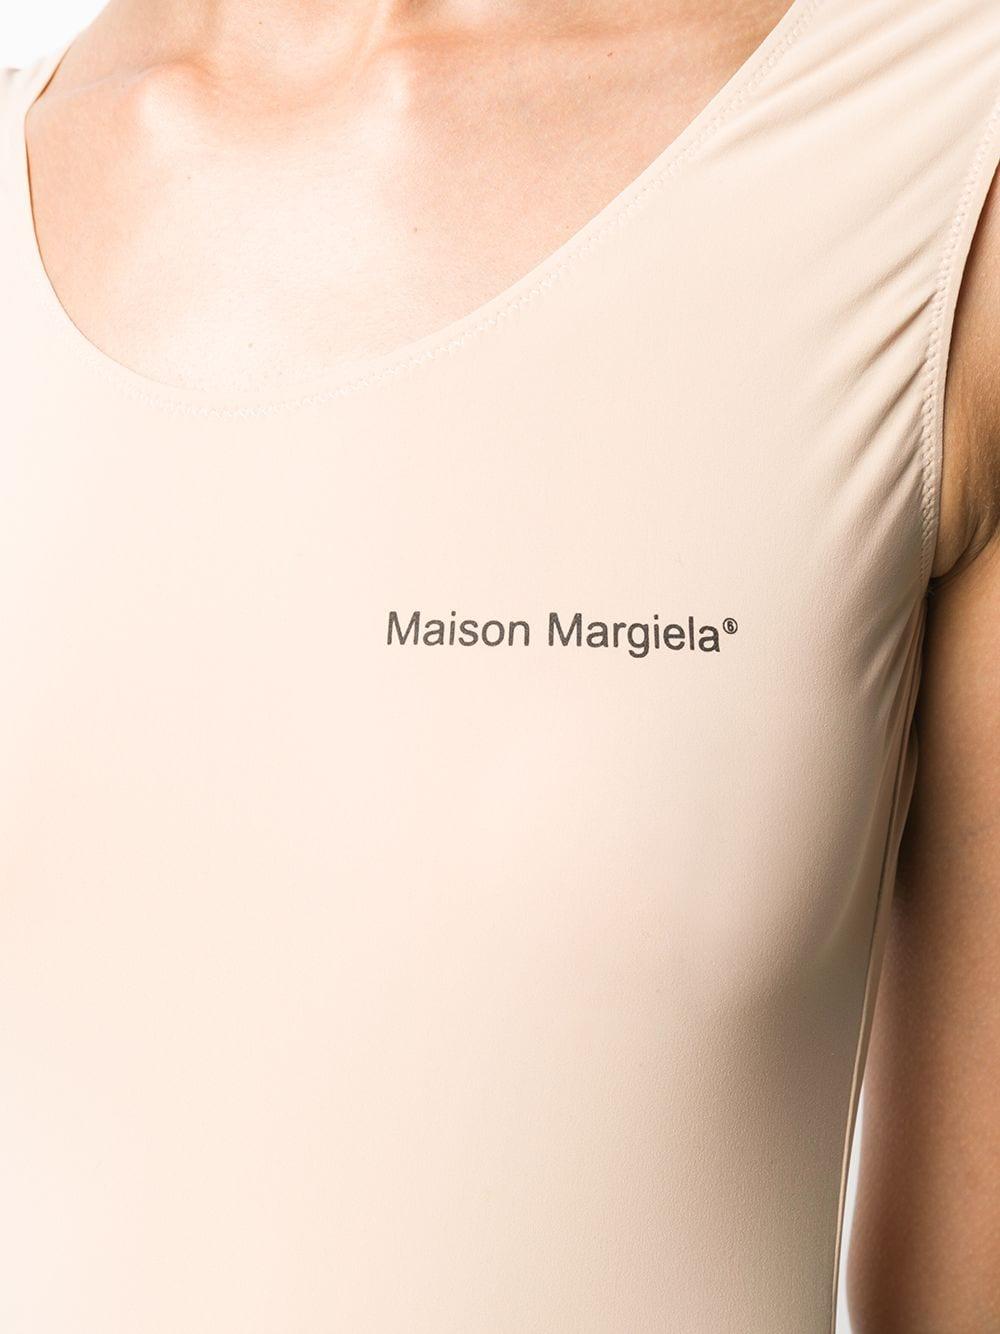 MM6 MAISON MARGIELA MM6 MAISON MARGIELA | Body | S32NA0047S20518121